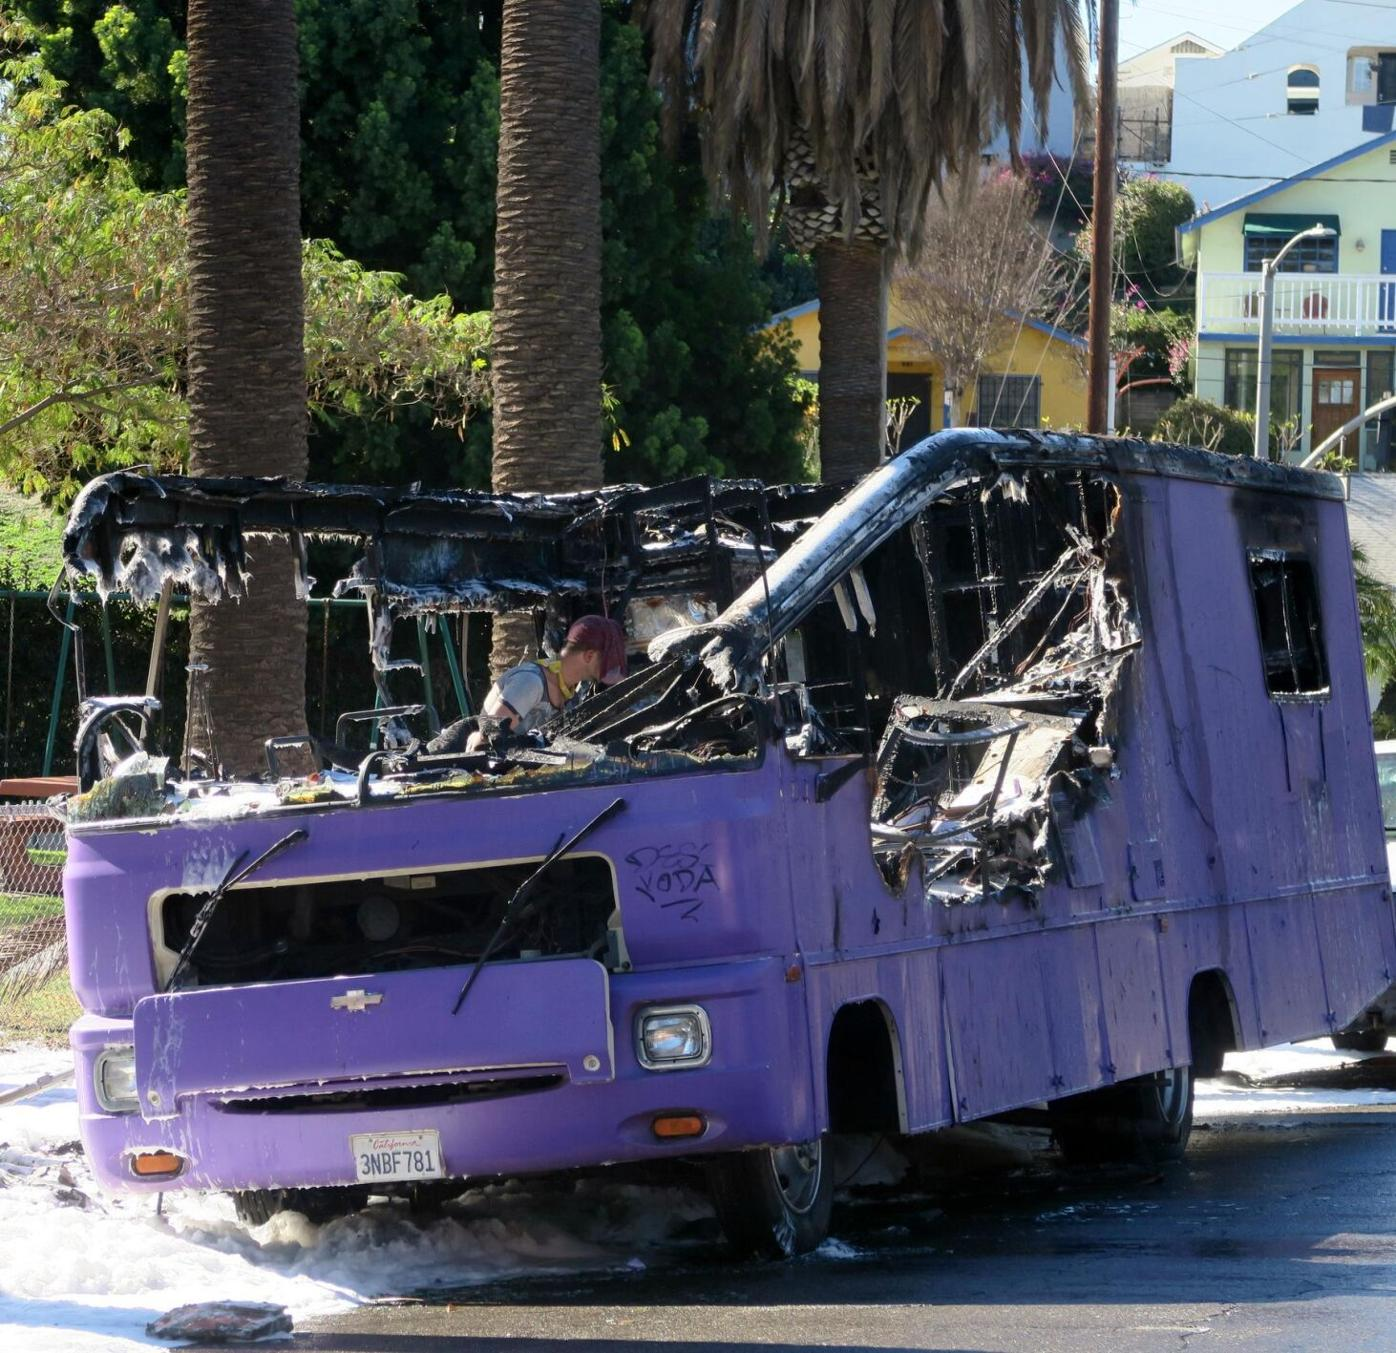 Burned wreckage of Echo Park purple bus